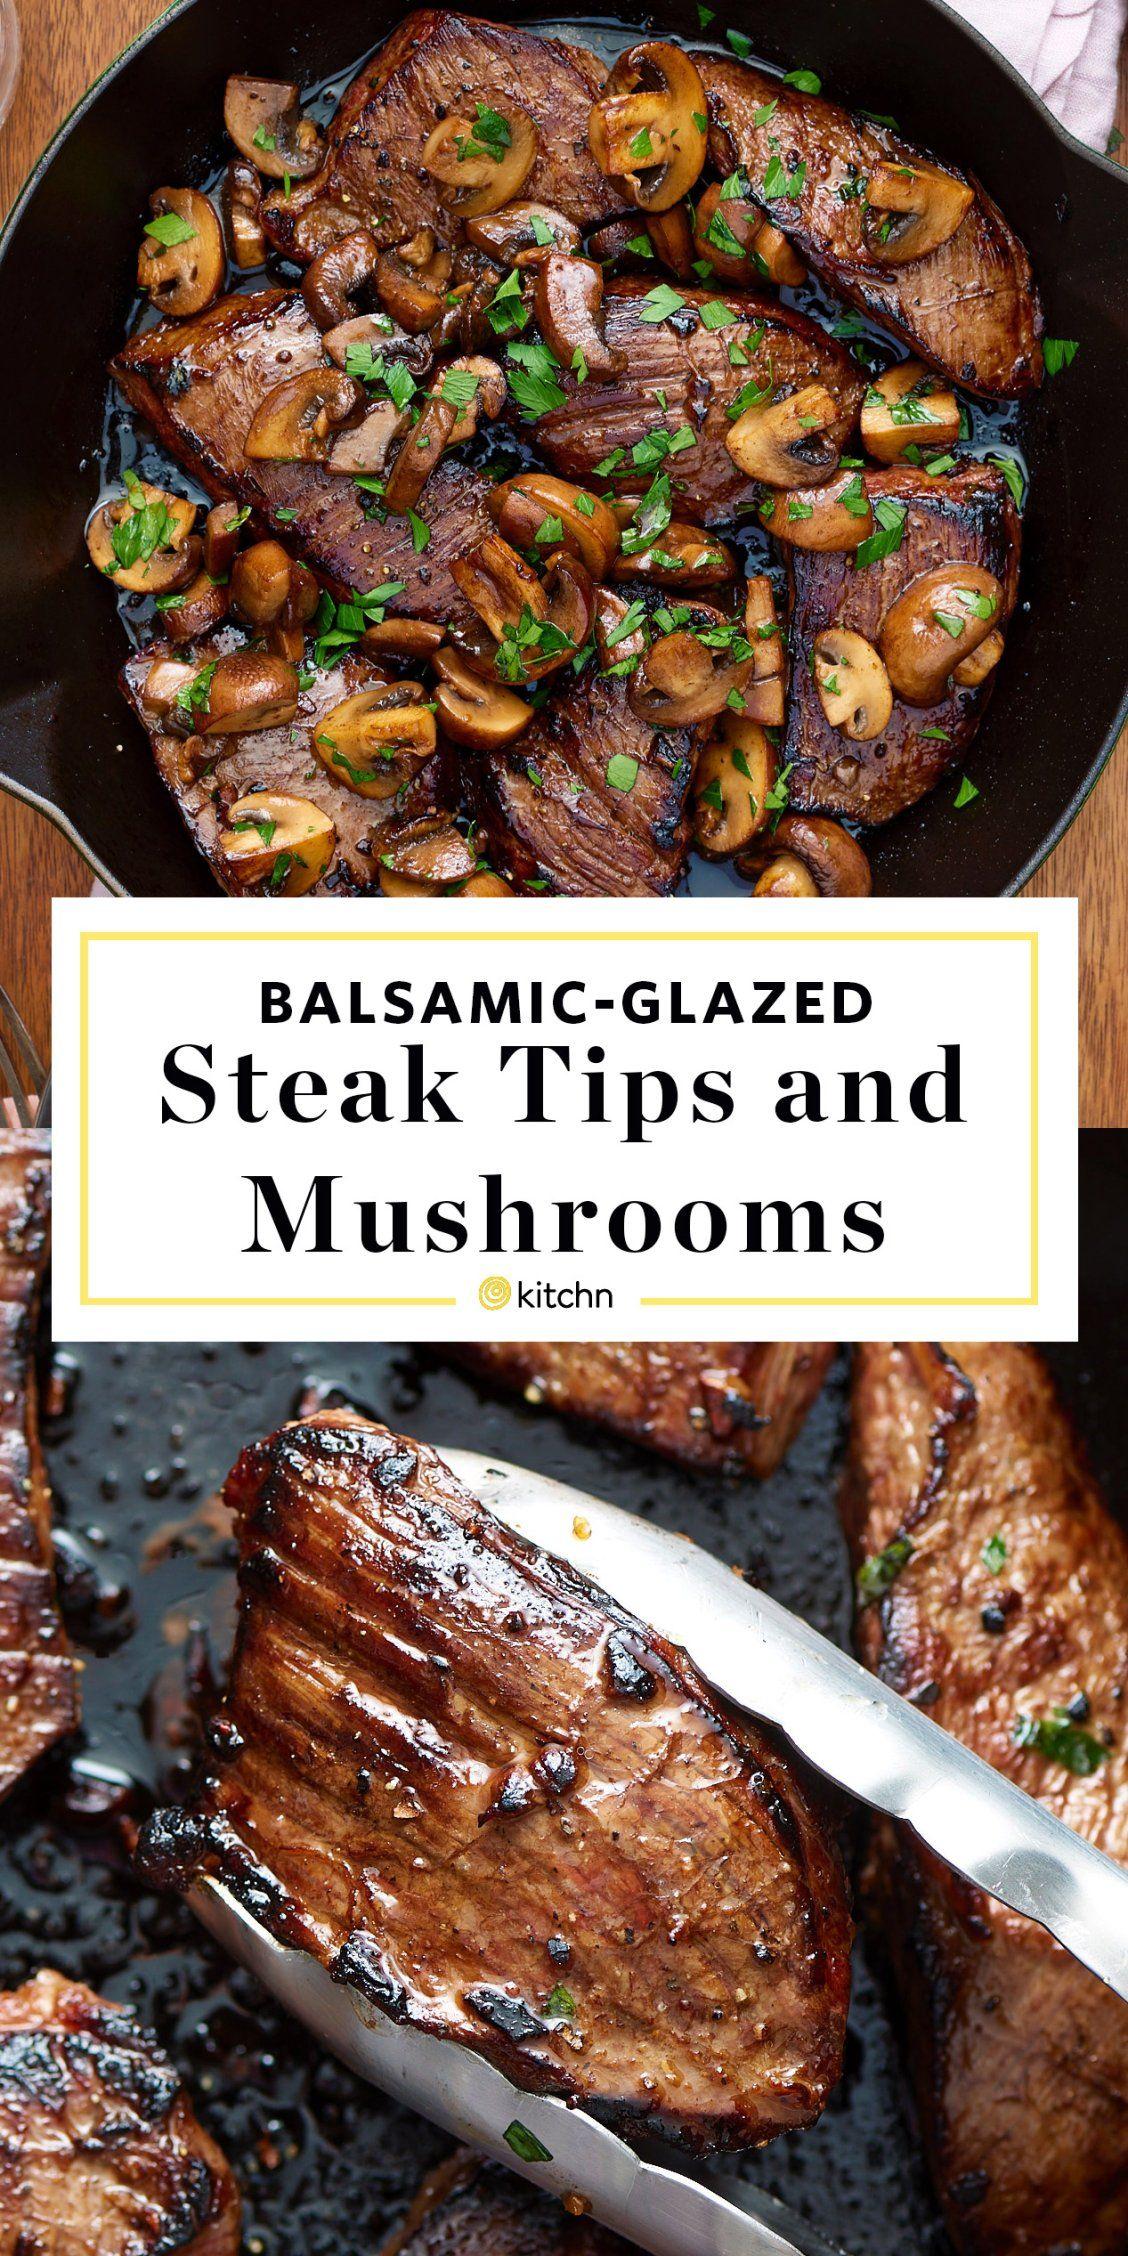 Easy Balsamic Glazed Steak Tips and Mushrooms #marinadeforbeef